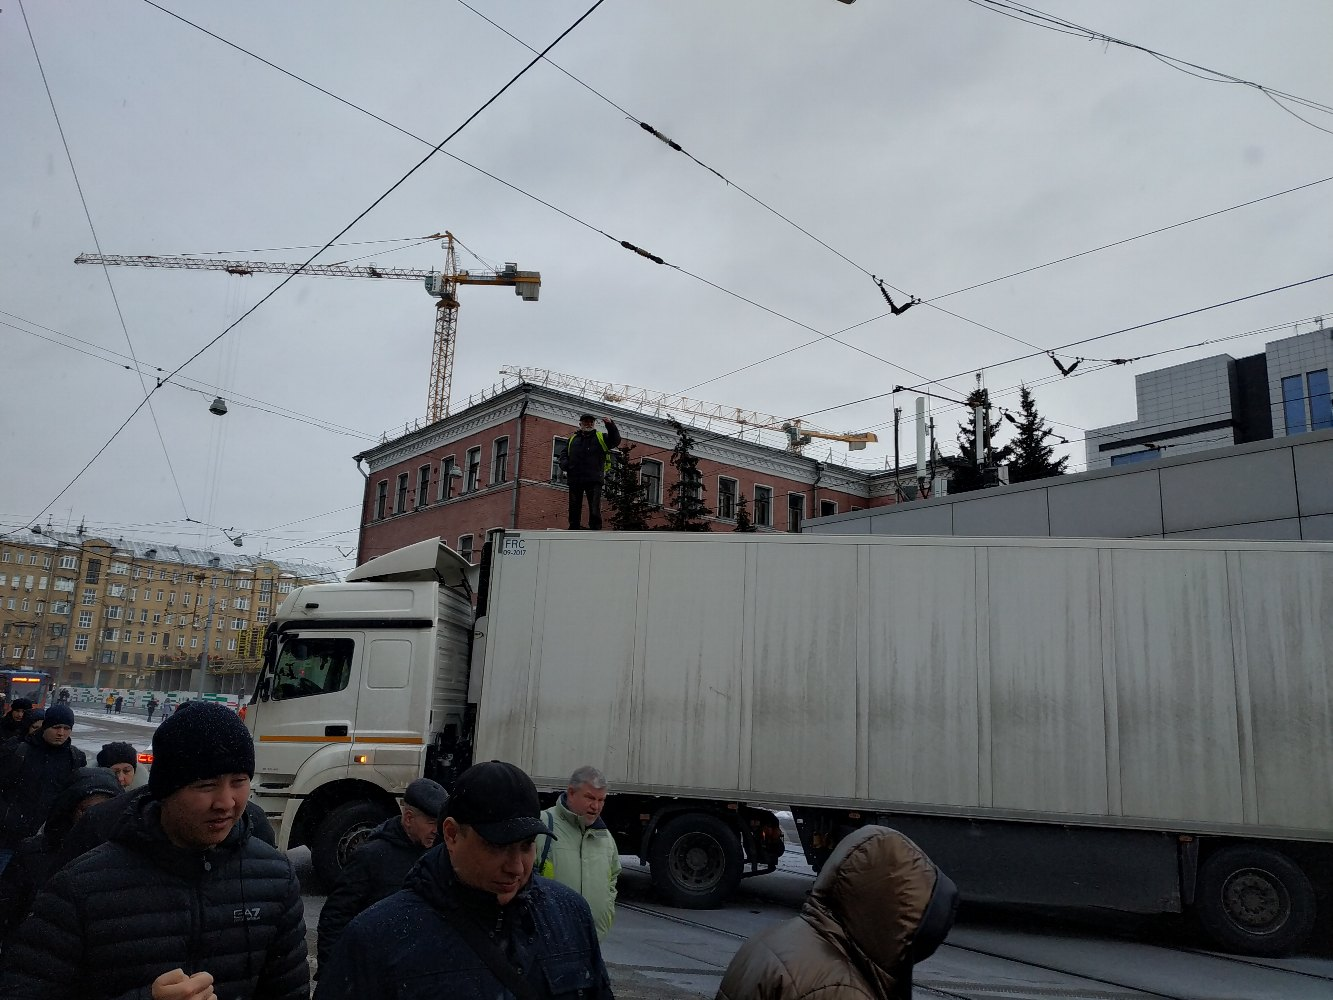 дальнобойщик перекрыл фурой бауманскую улицу